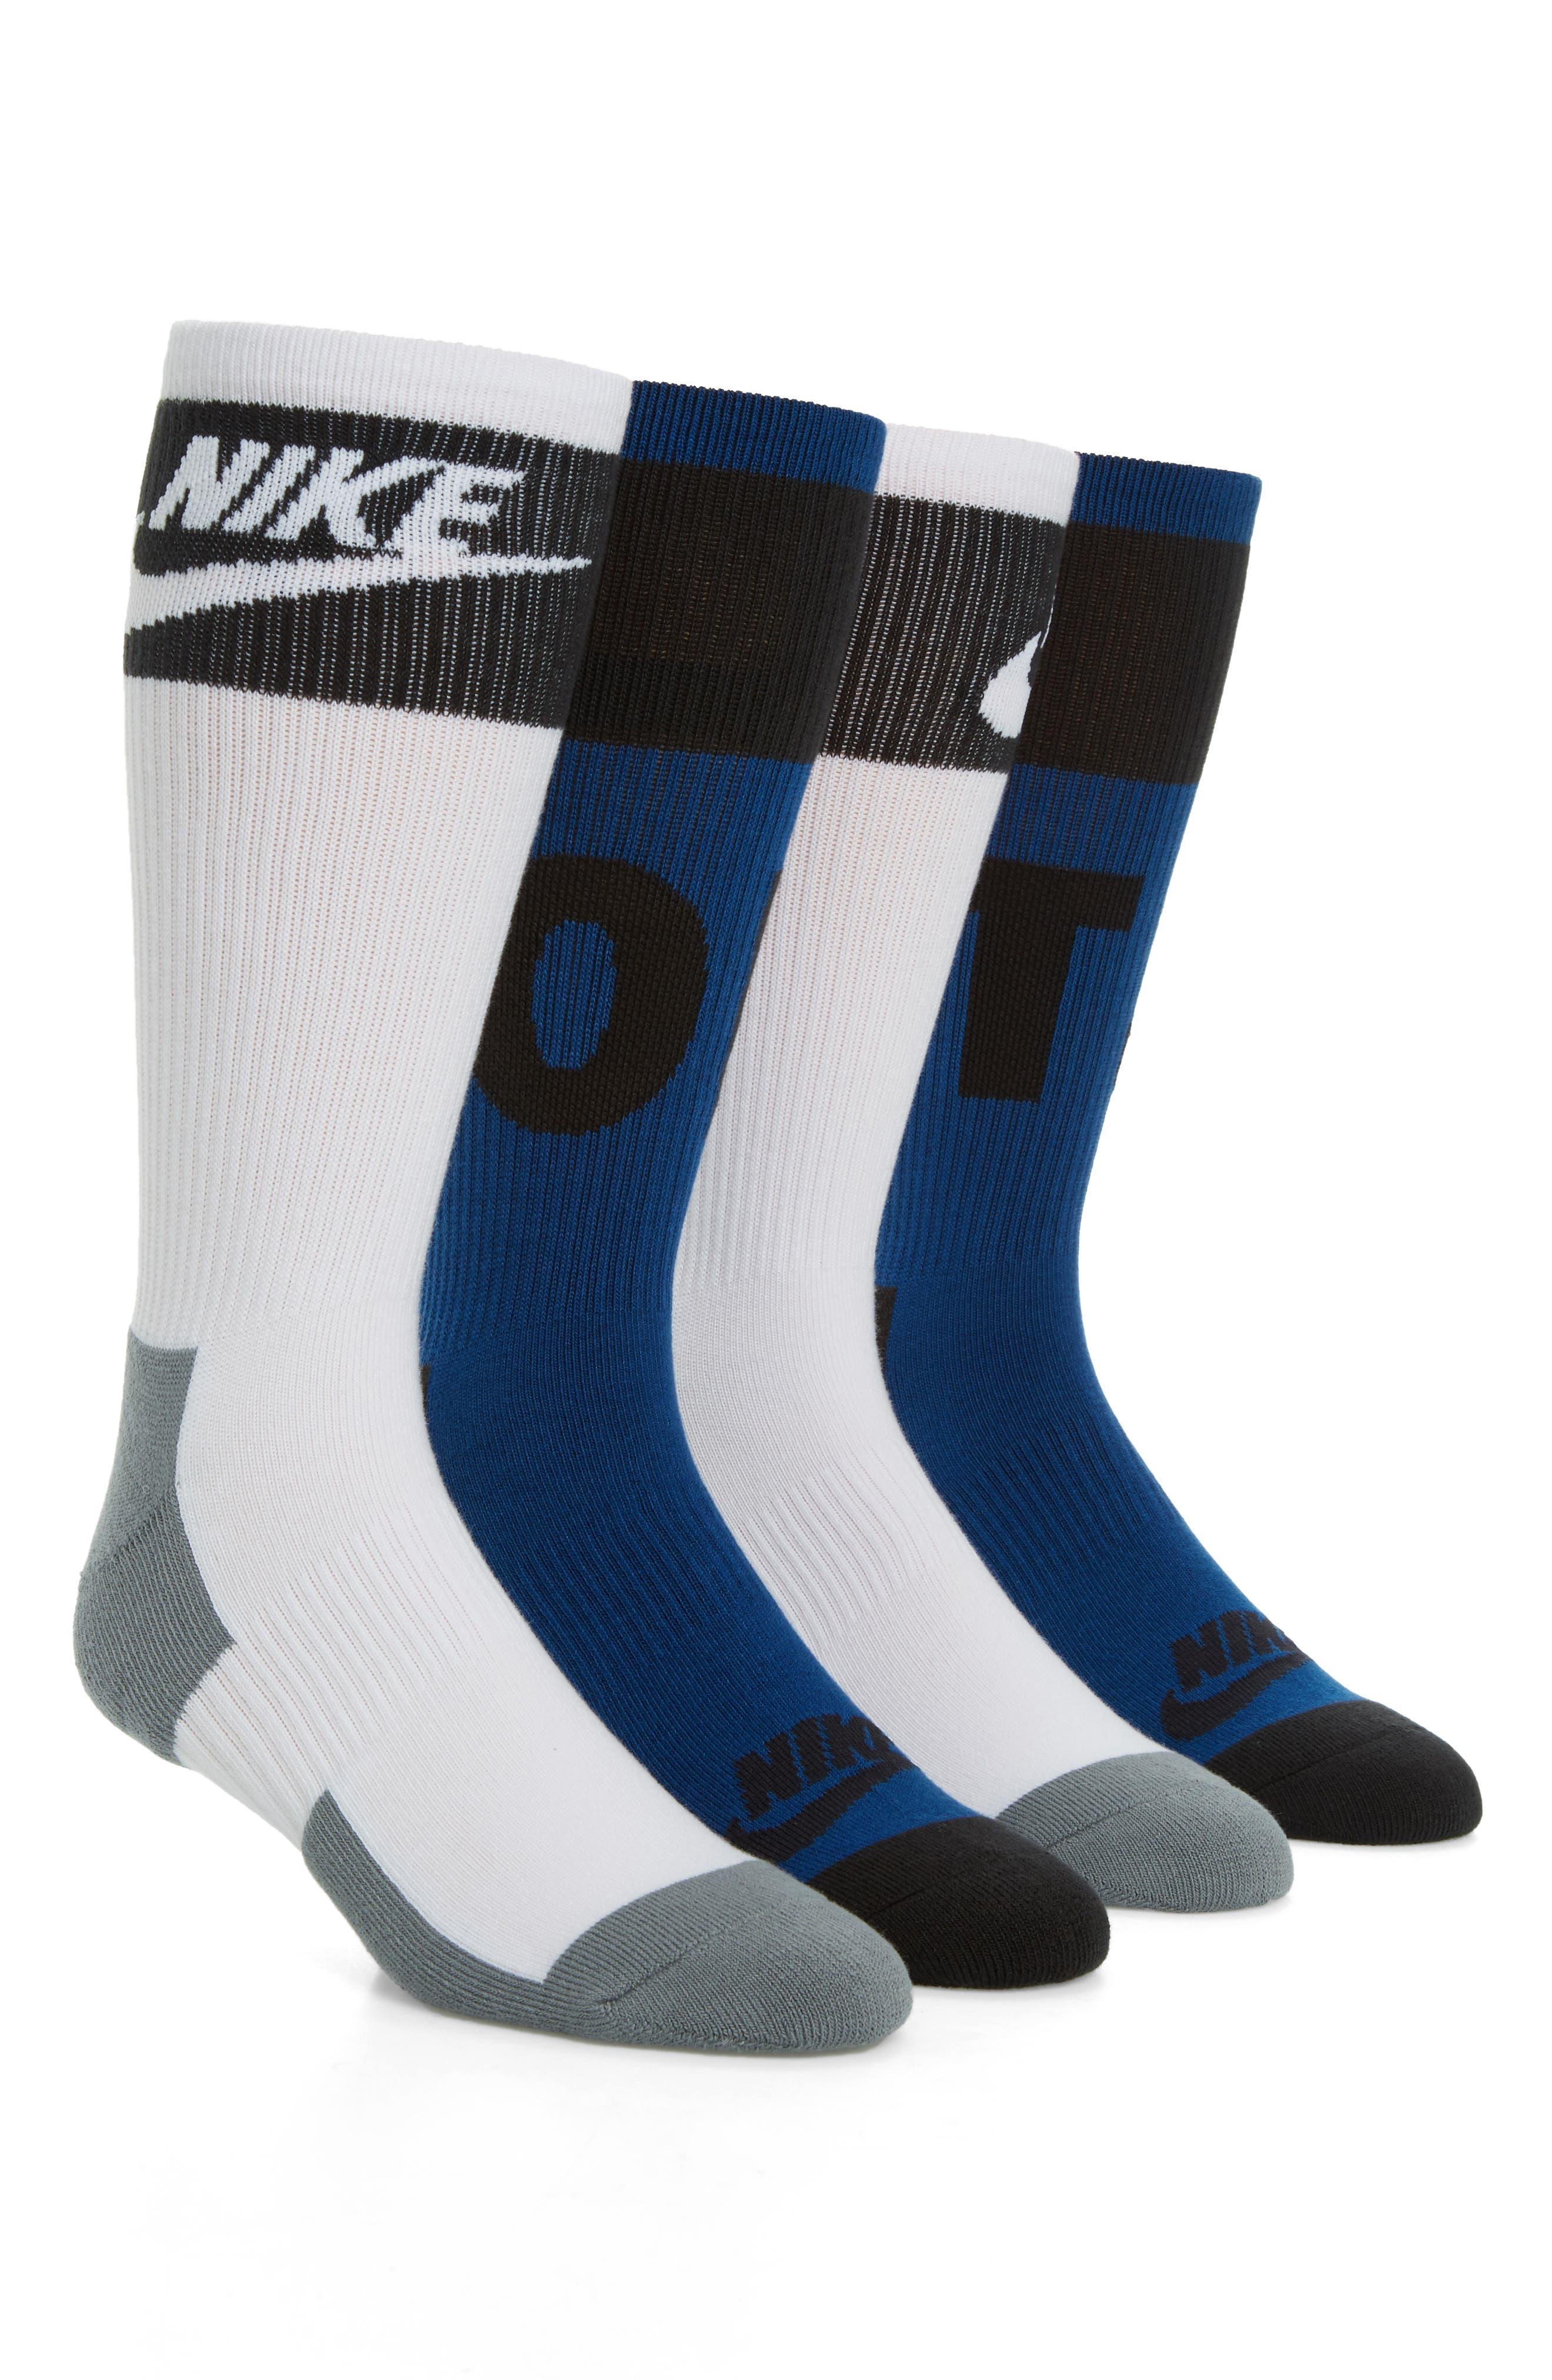 HBR 2-Pack Socks,                             Main thumbnail 1, color,                             Binary Blue/ White